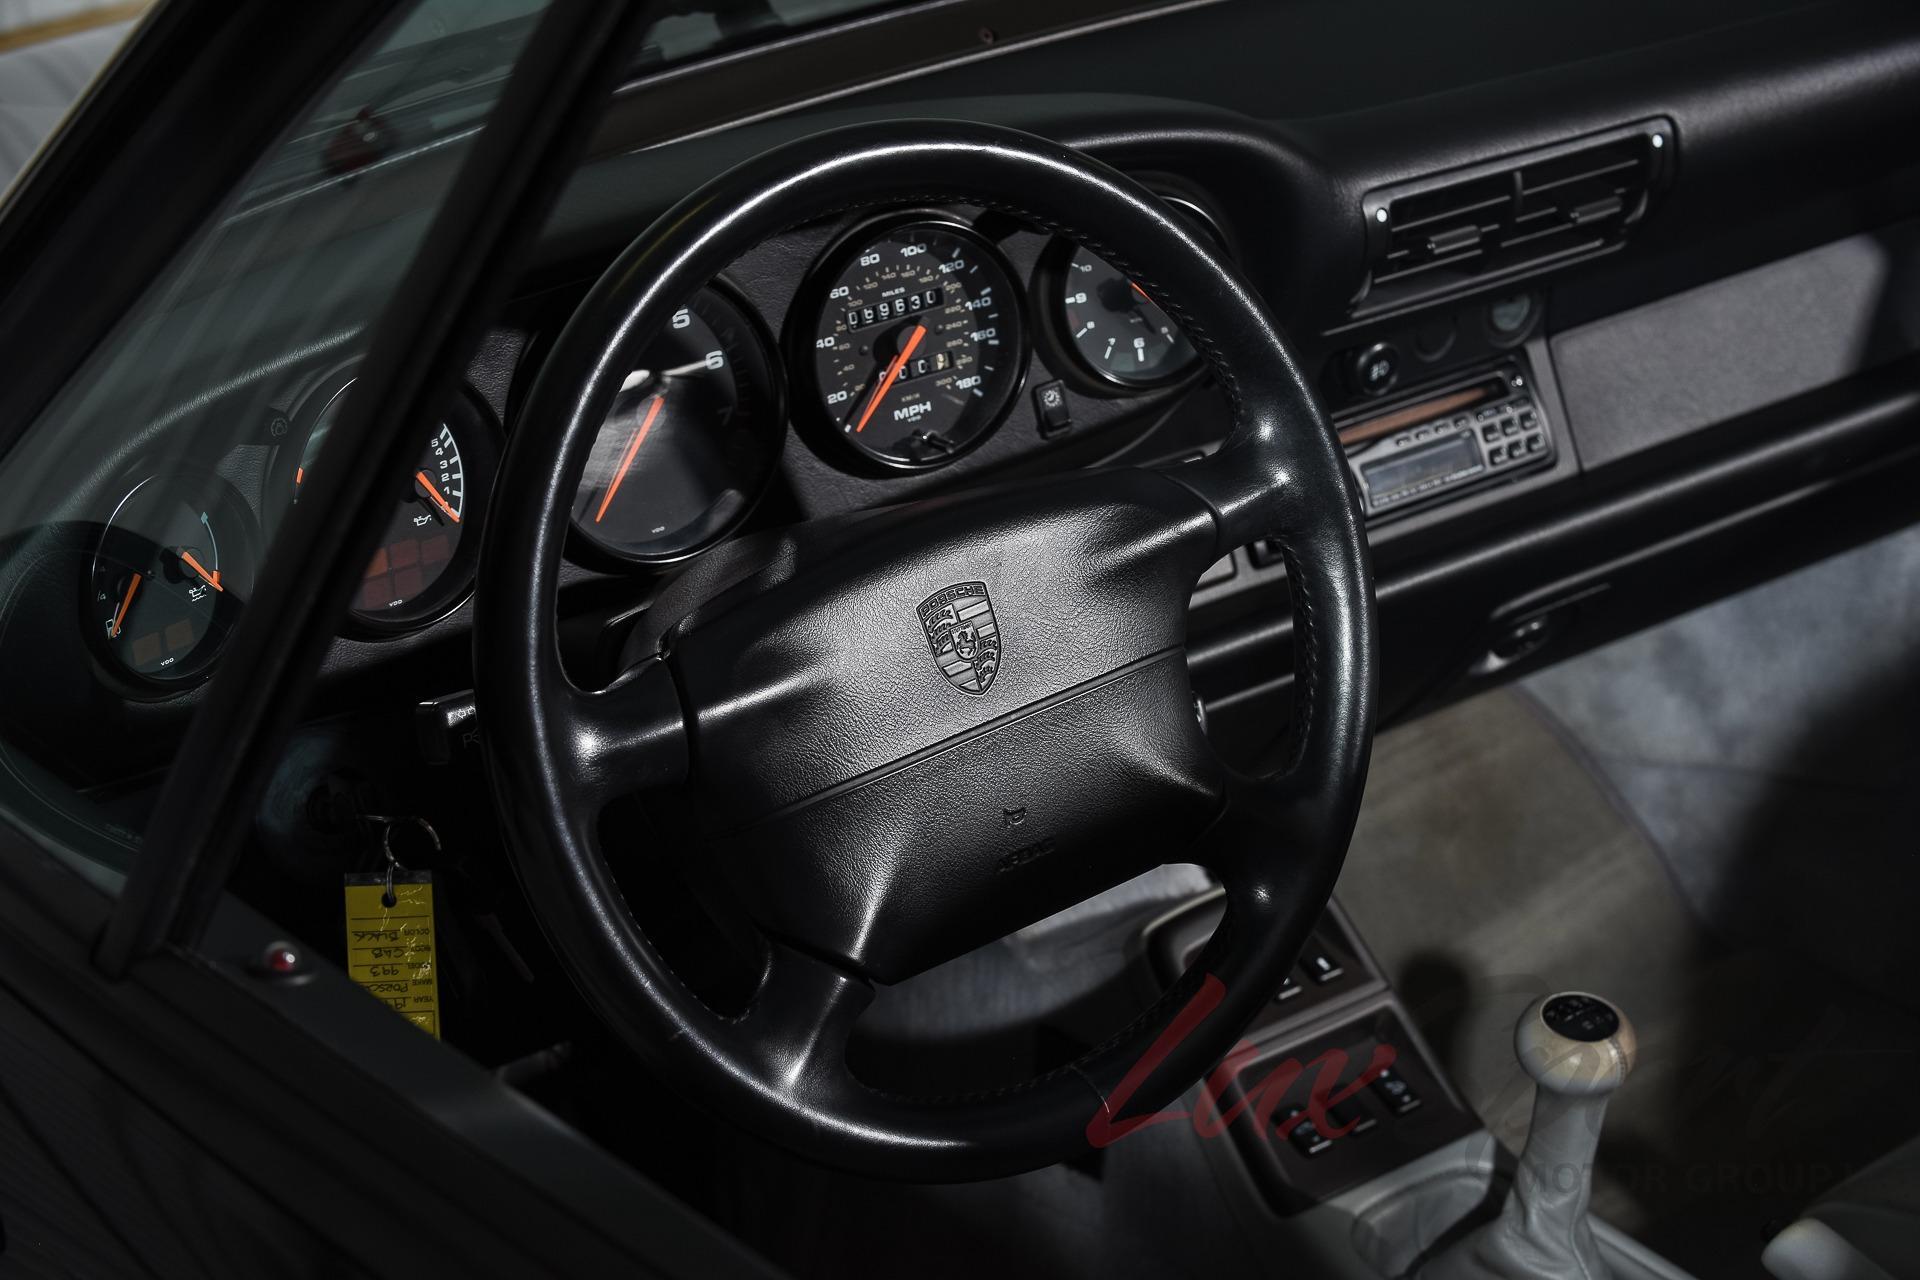 Used 1995 Porsche 993 Carrera 2 Cabriolet  | New Hyde Park, NY